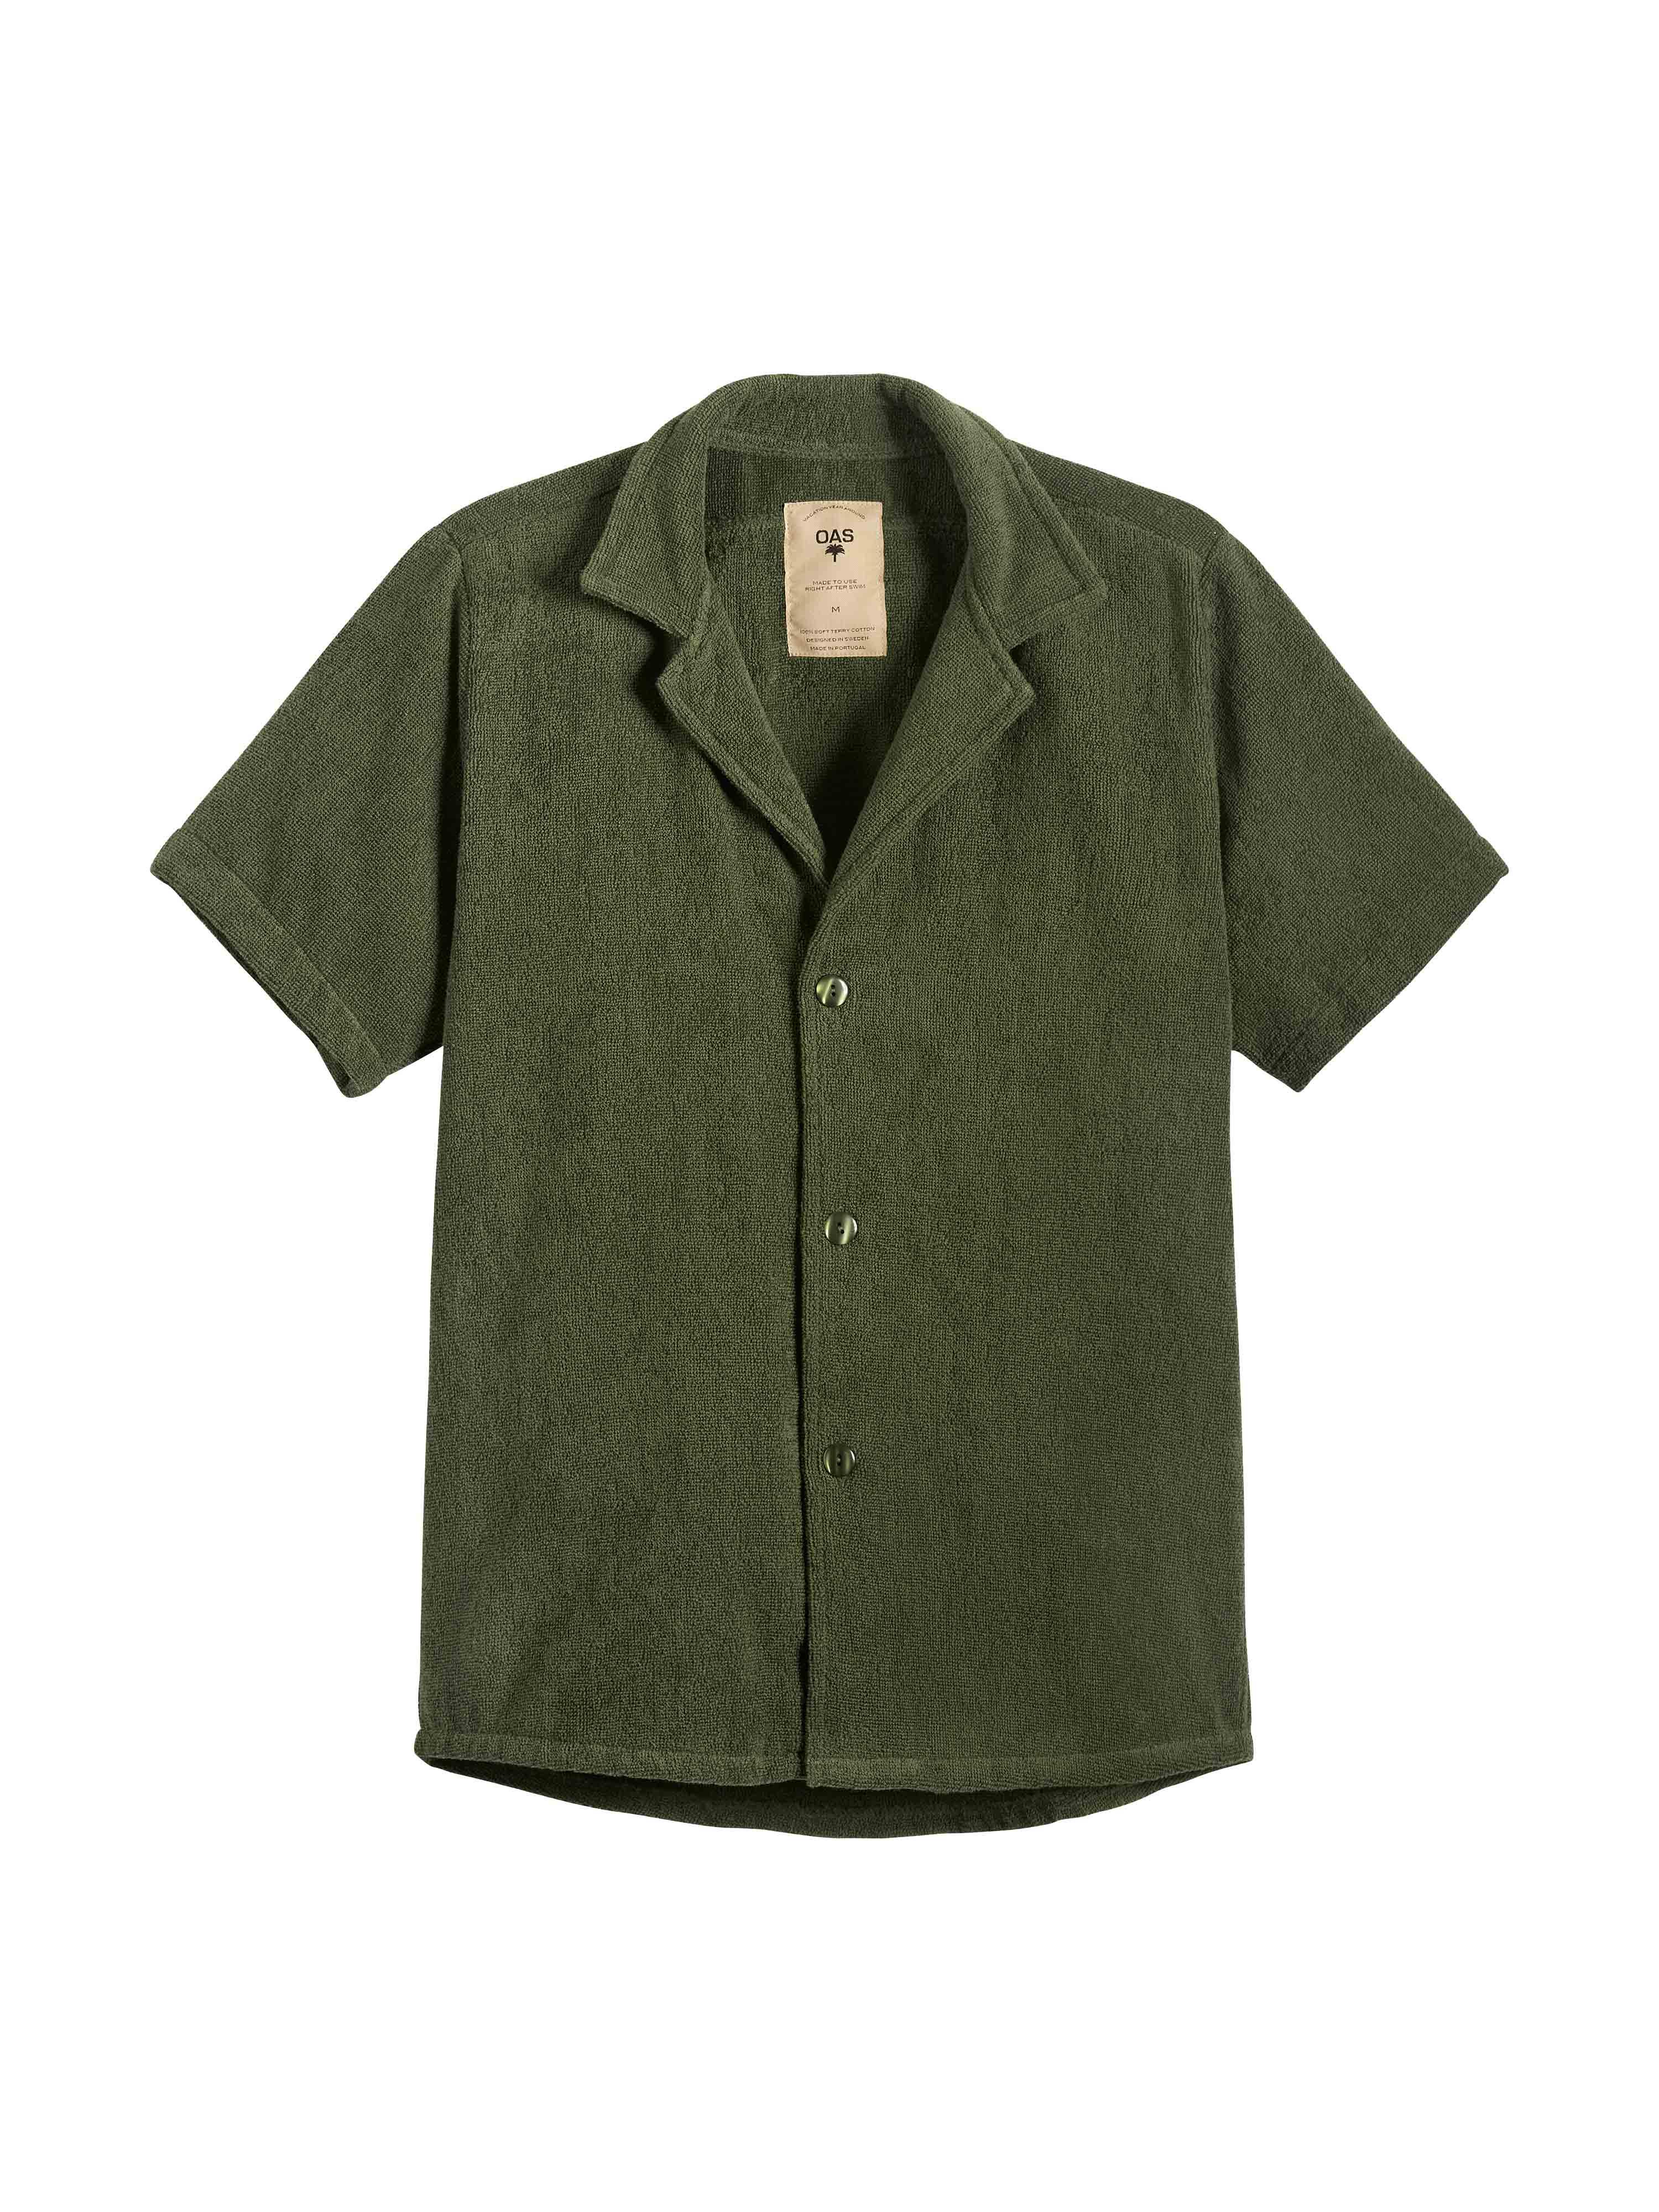 Army Cuba Terry Shirt